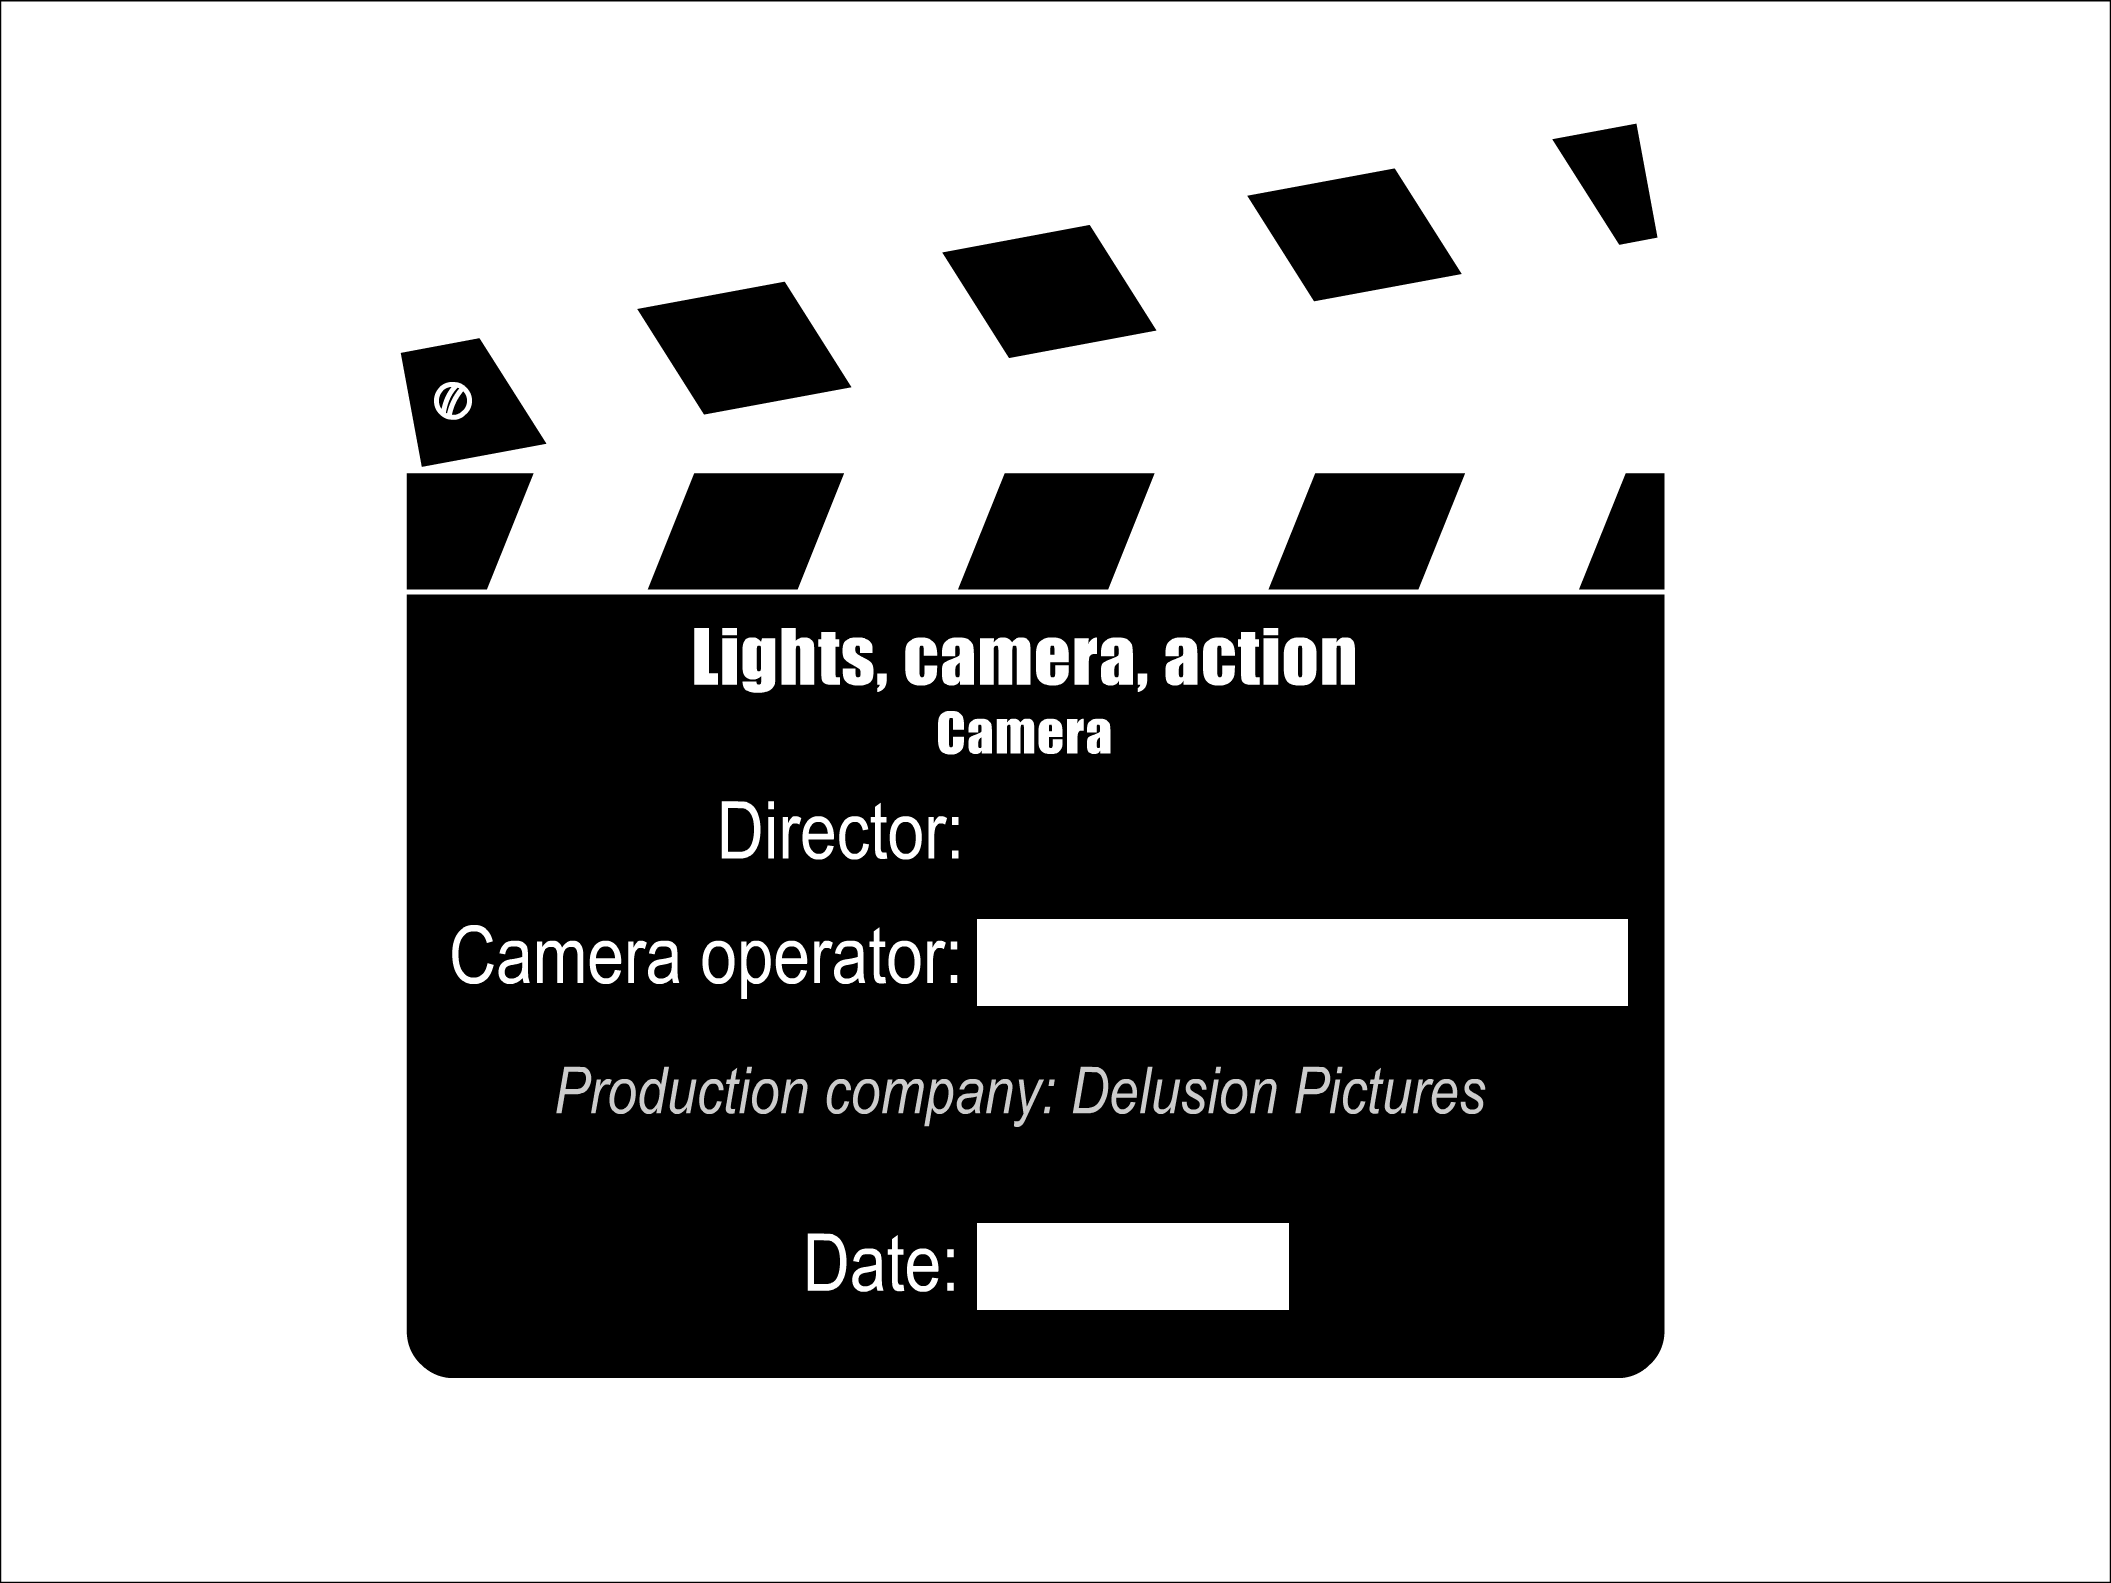 Lighting clipart lights camera action. Democraciaejustica